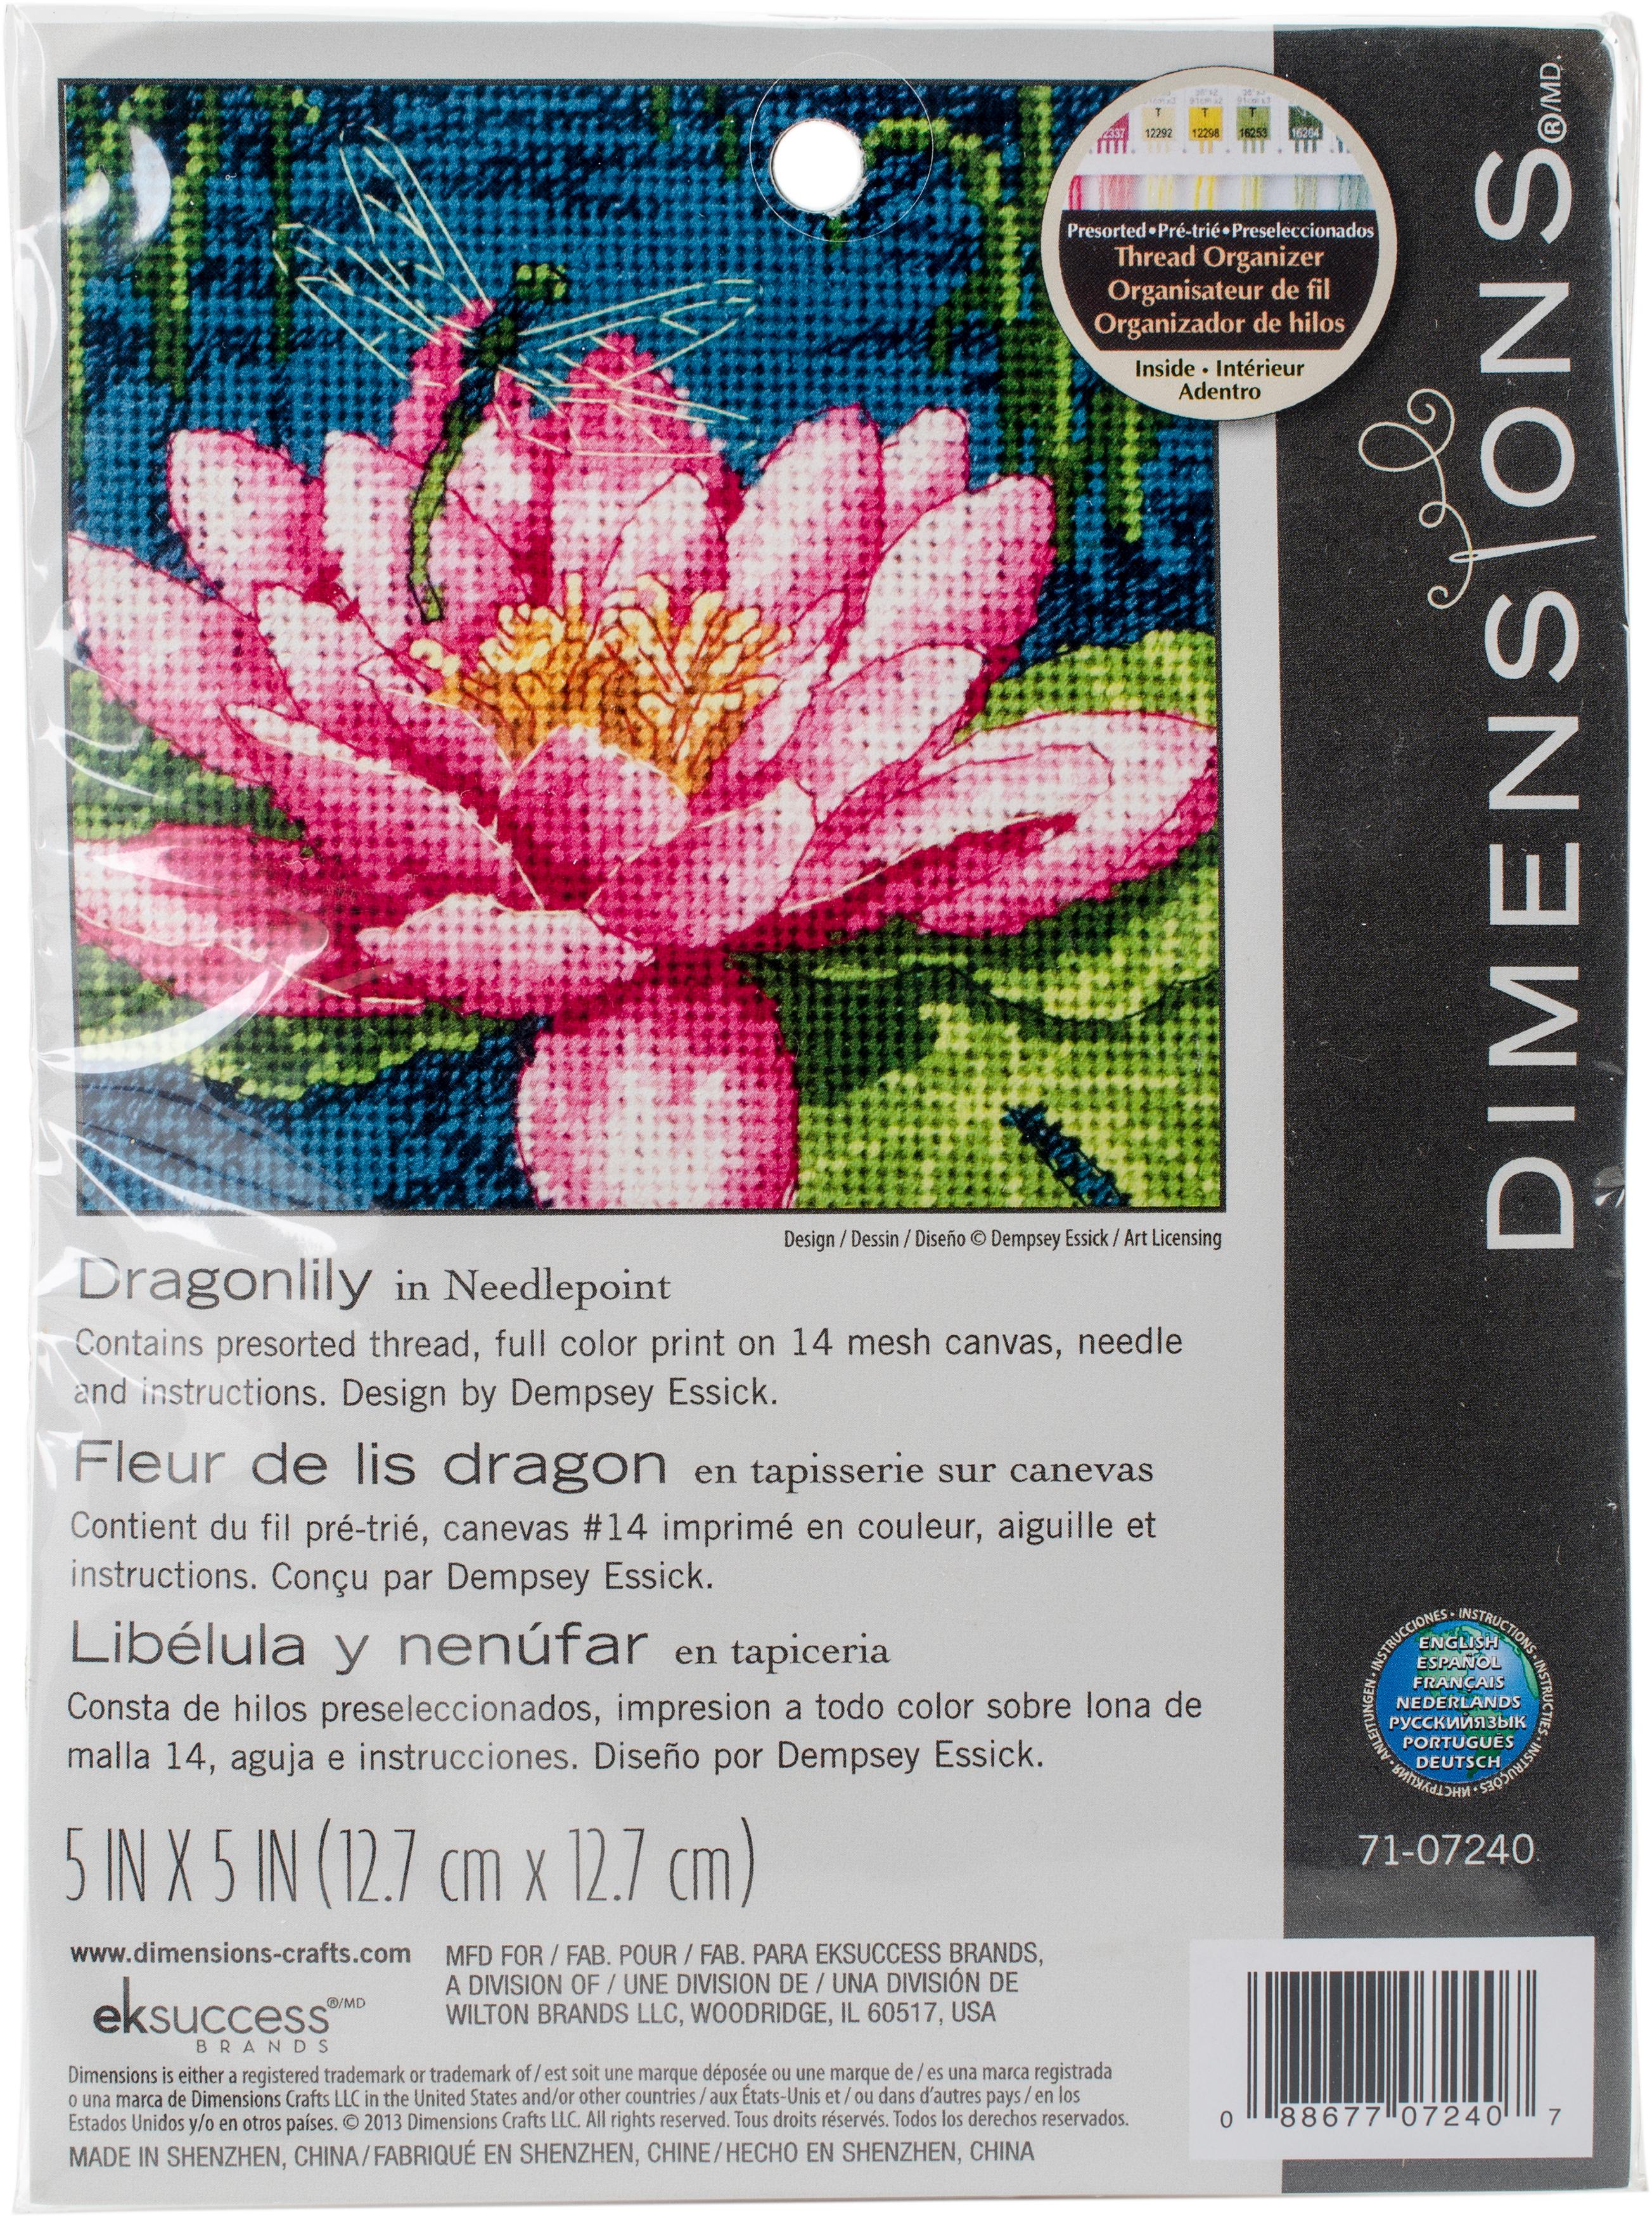 5 x 5 Dragon lily Dimensions Needlepoint Kit